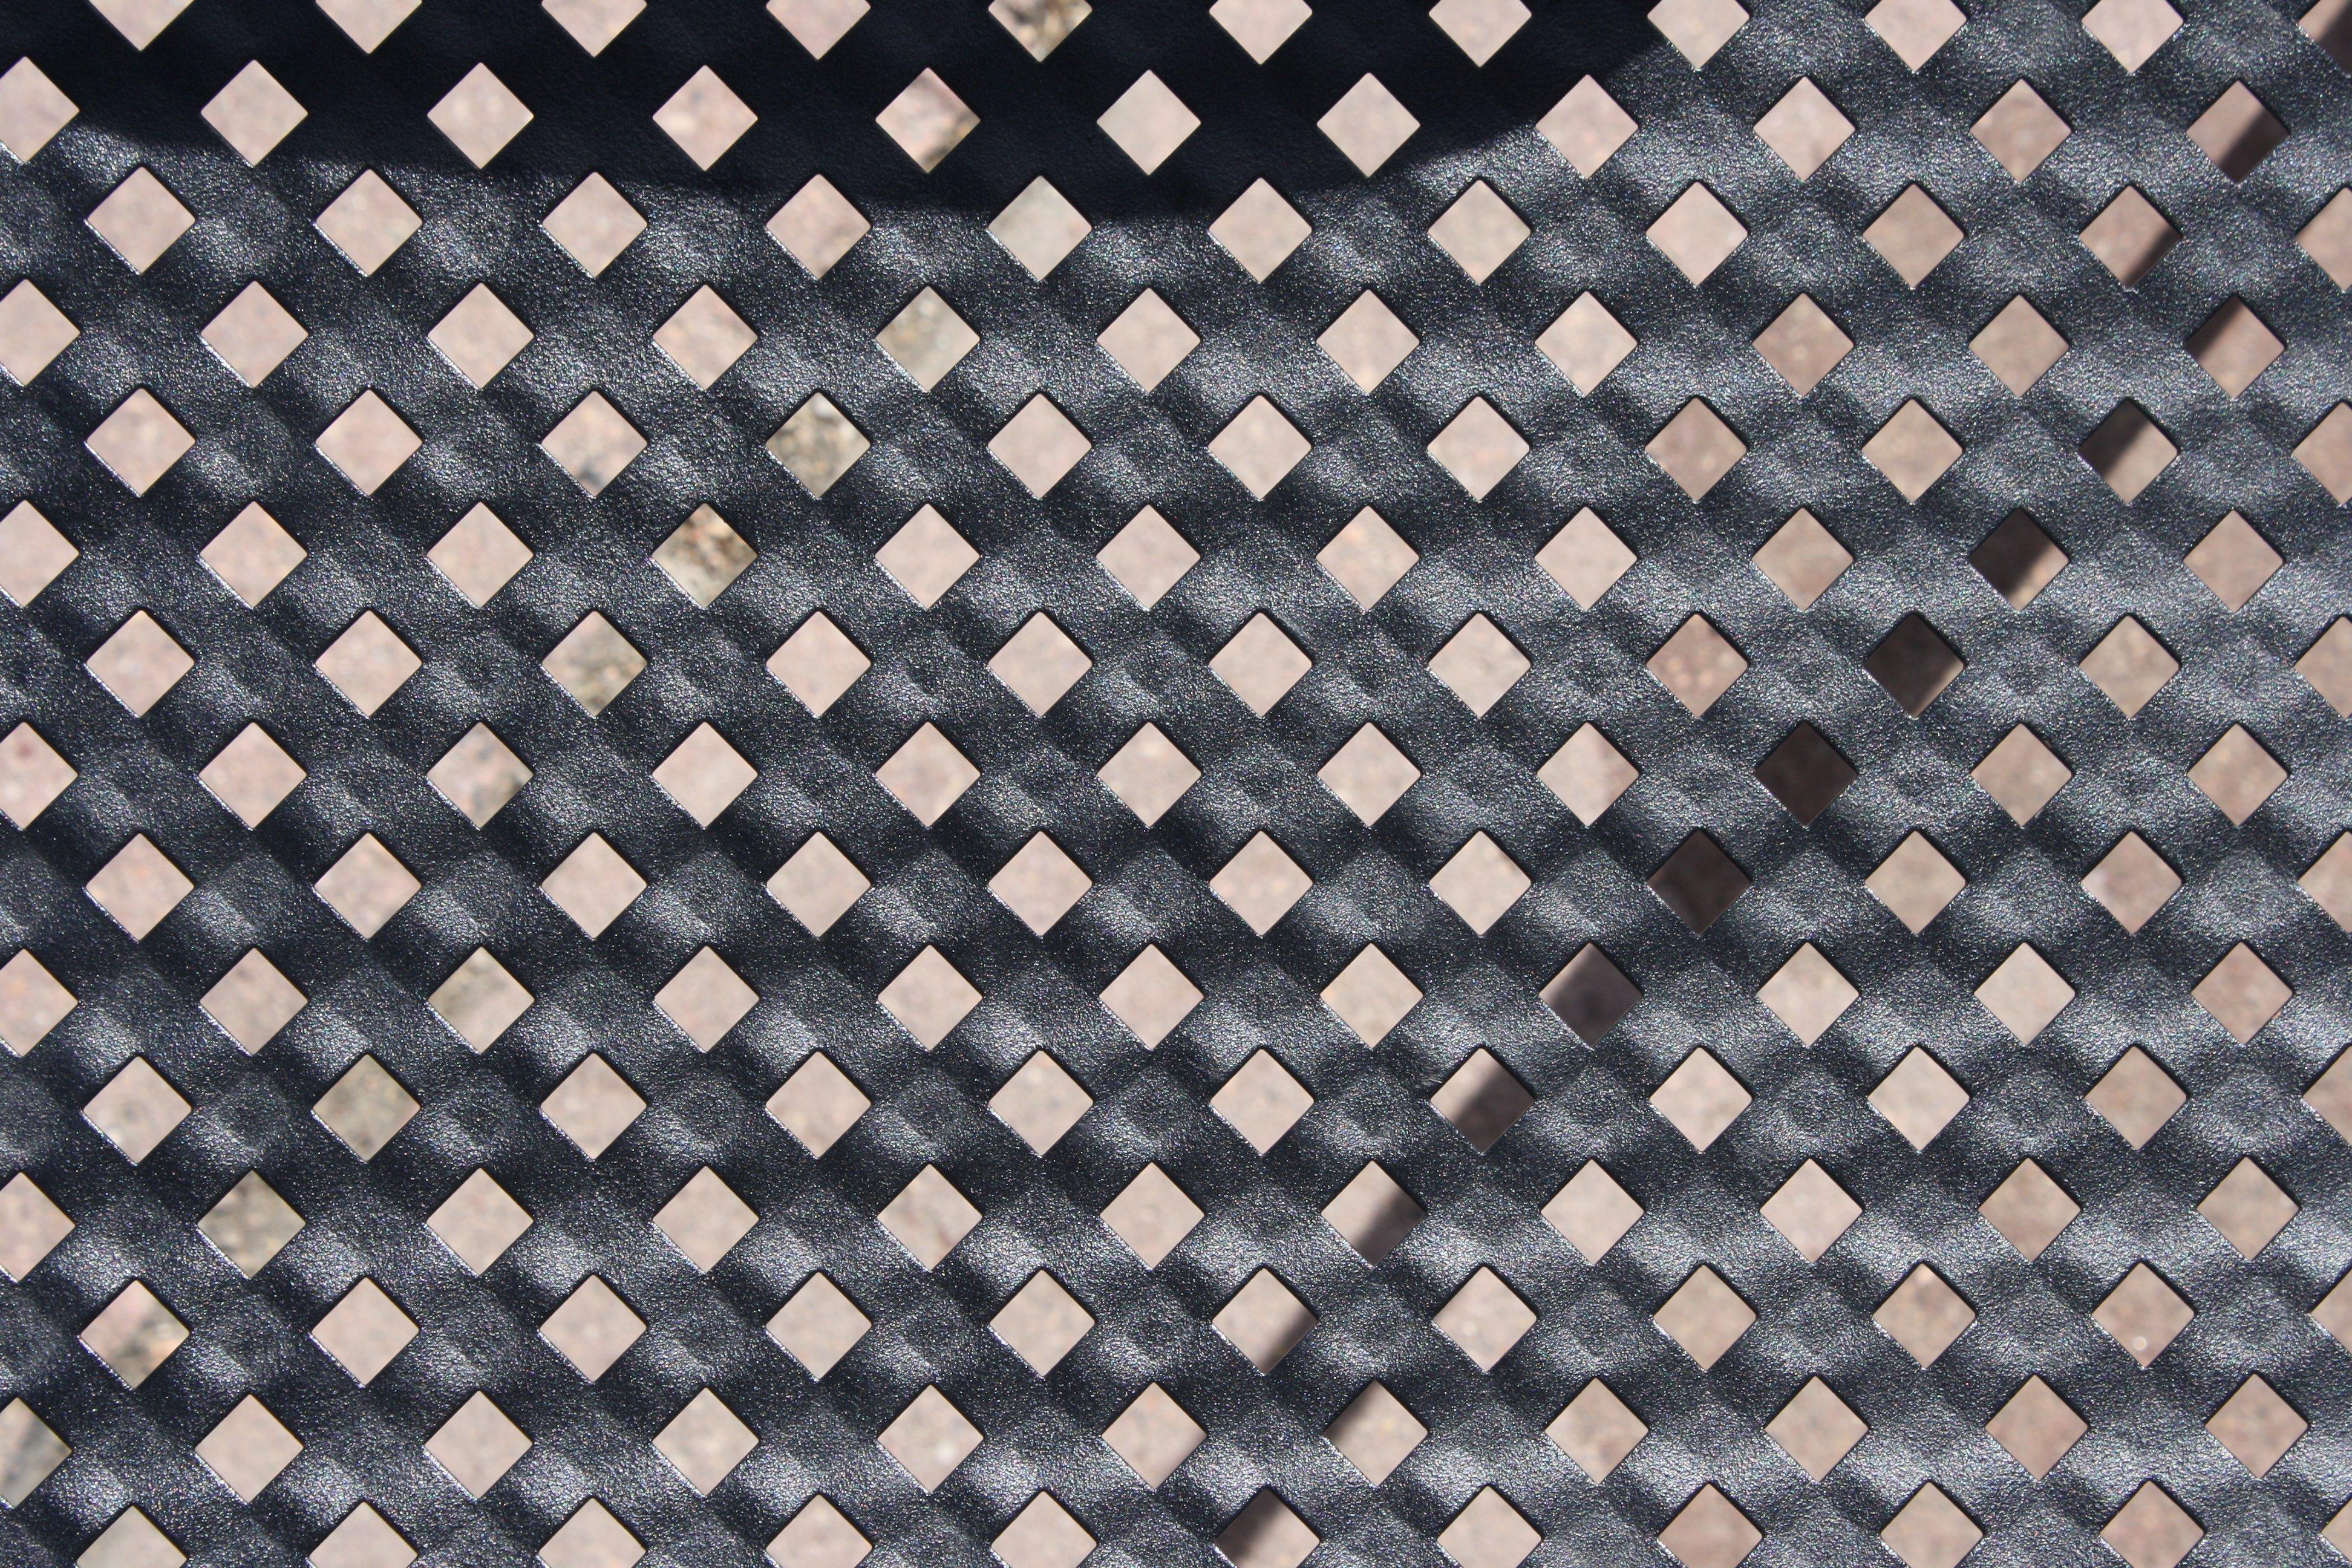 Black Metal Cross Grid Texture Picture | Free Photograph | Photos ...